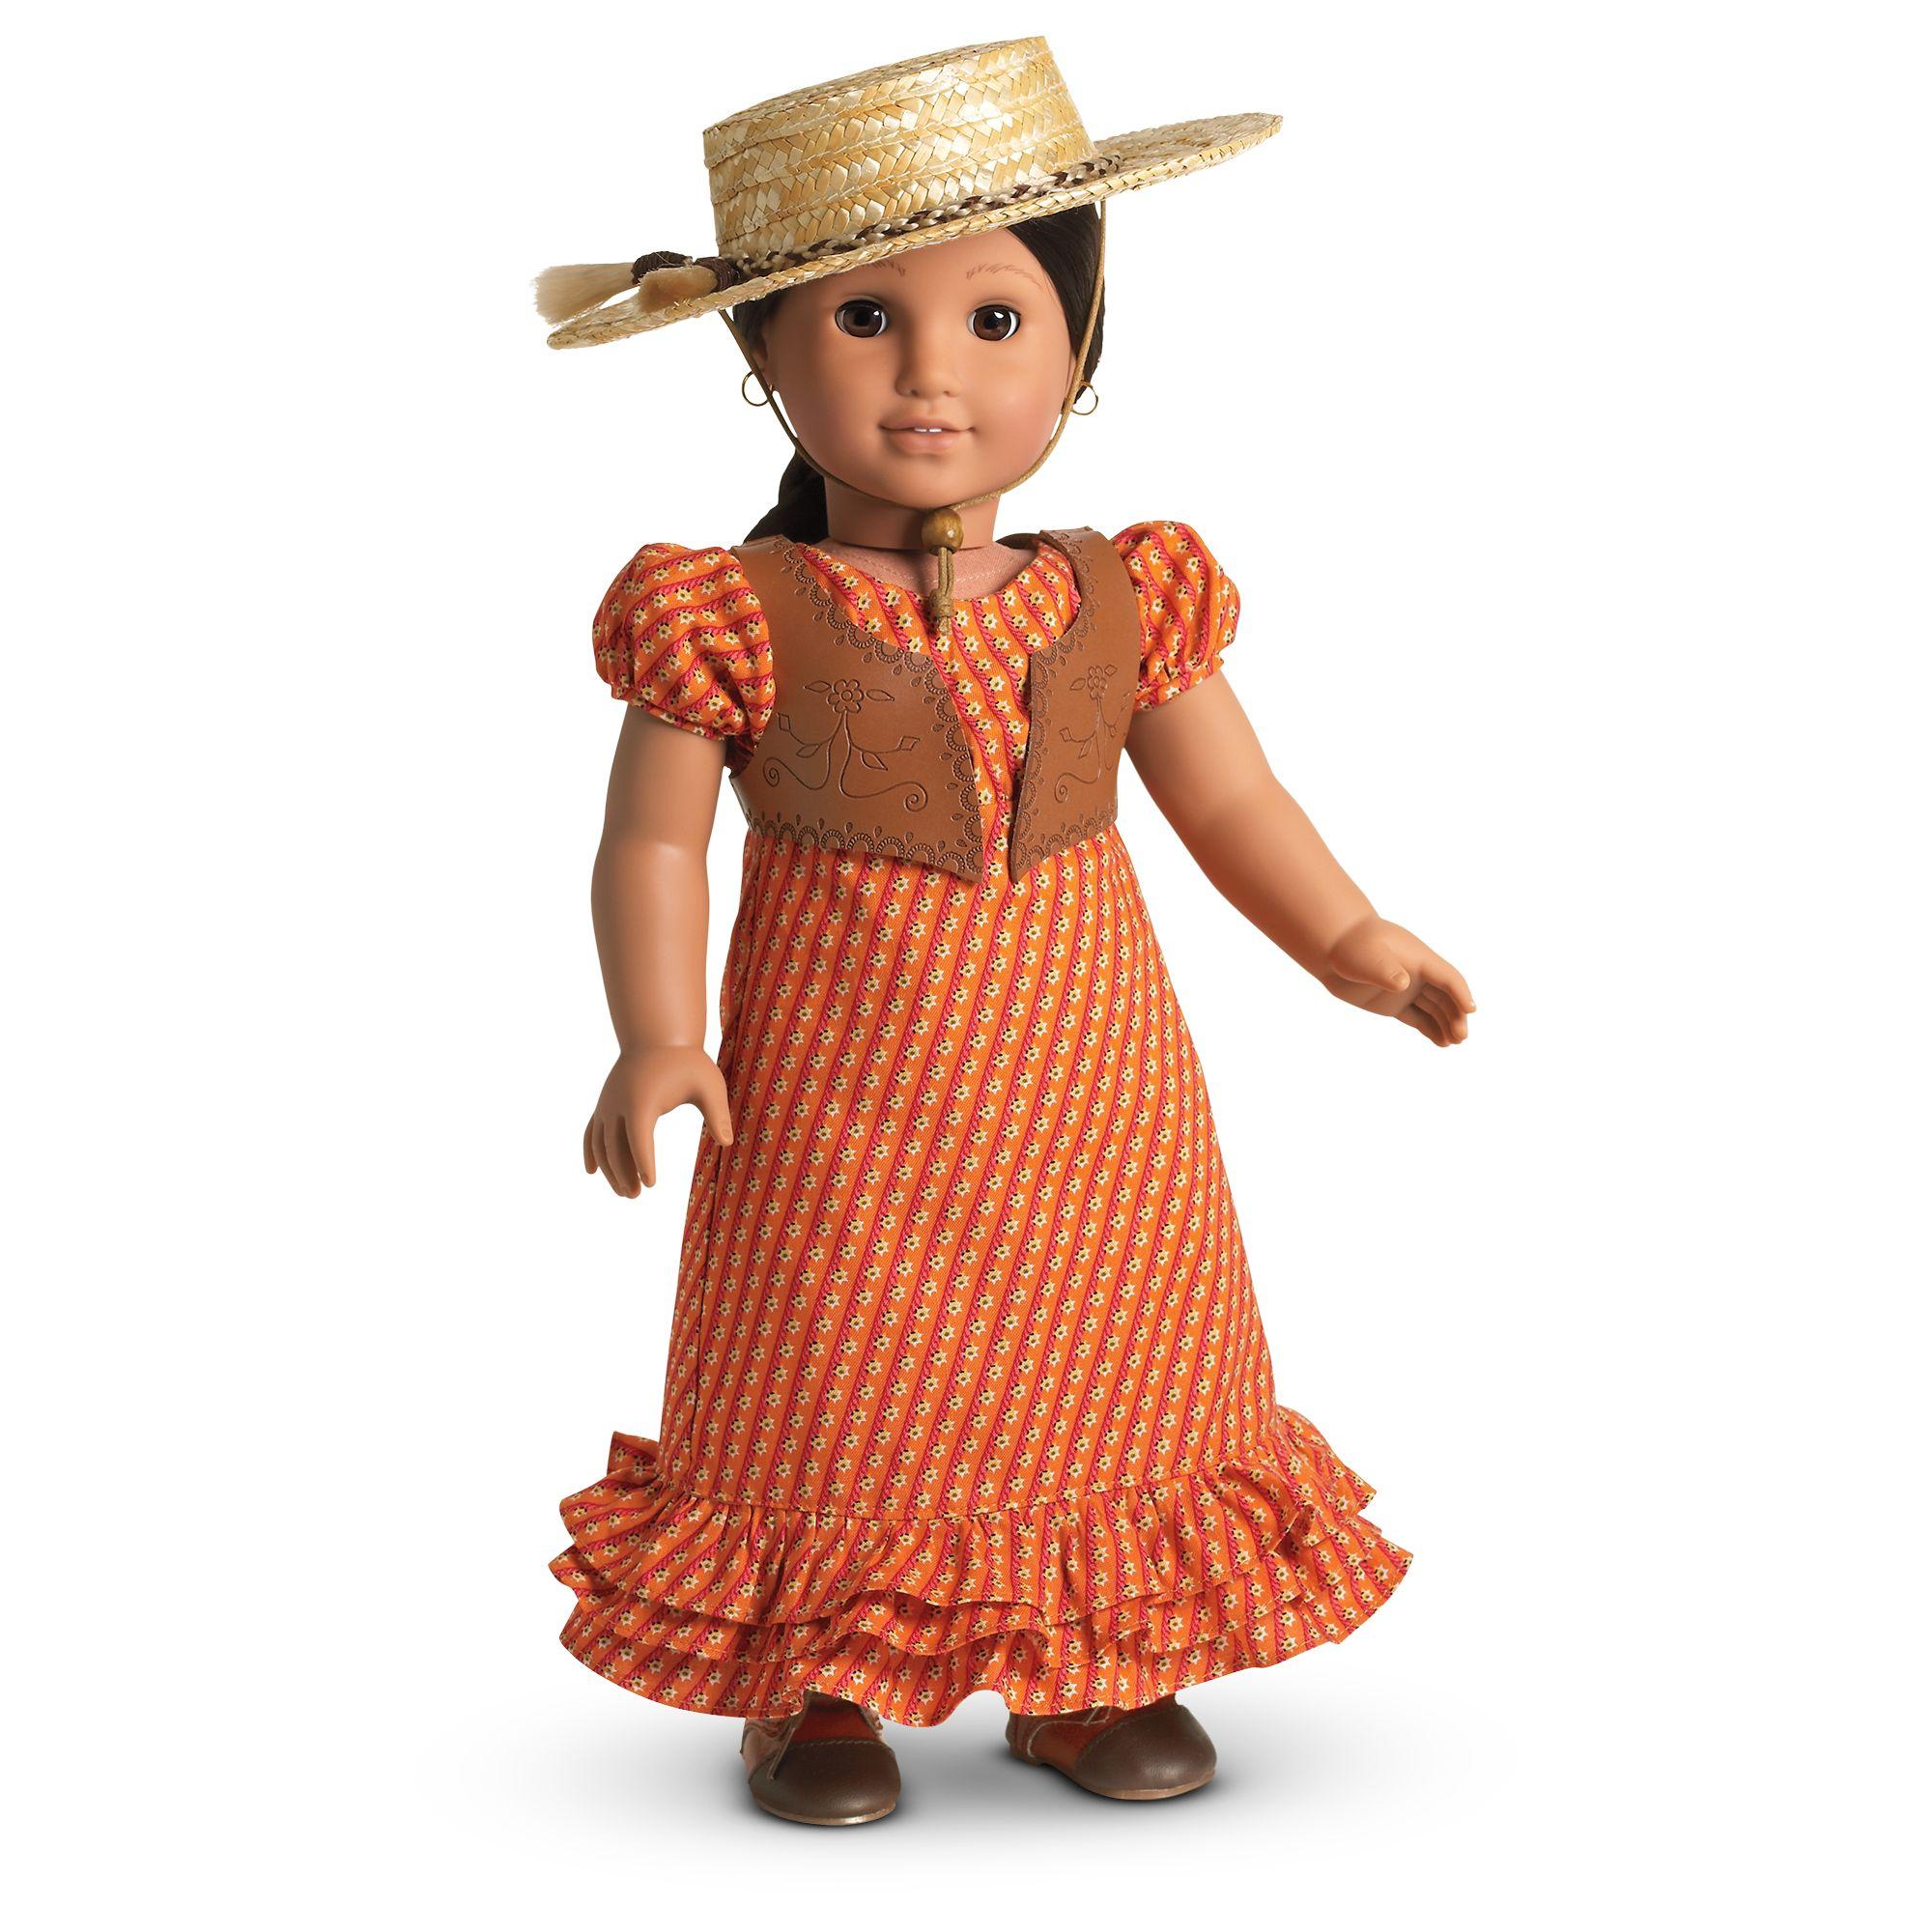 Josefina's Summer Riding Dress and Hat